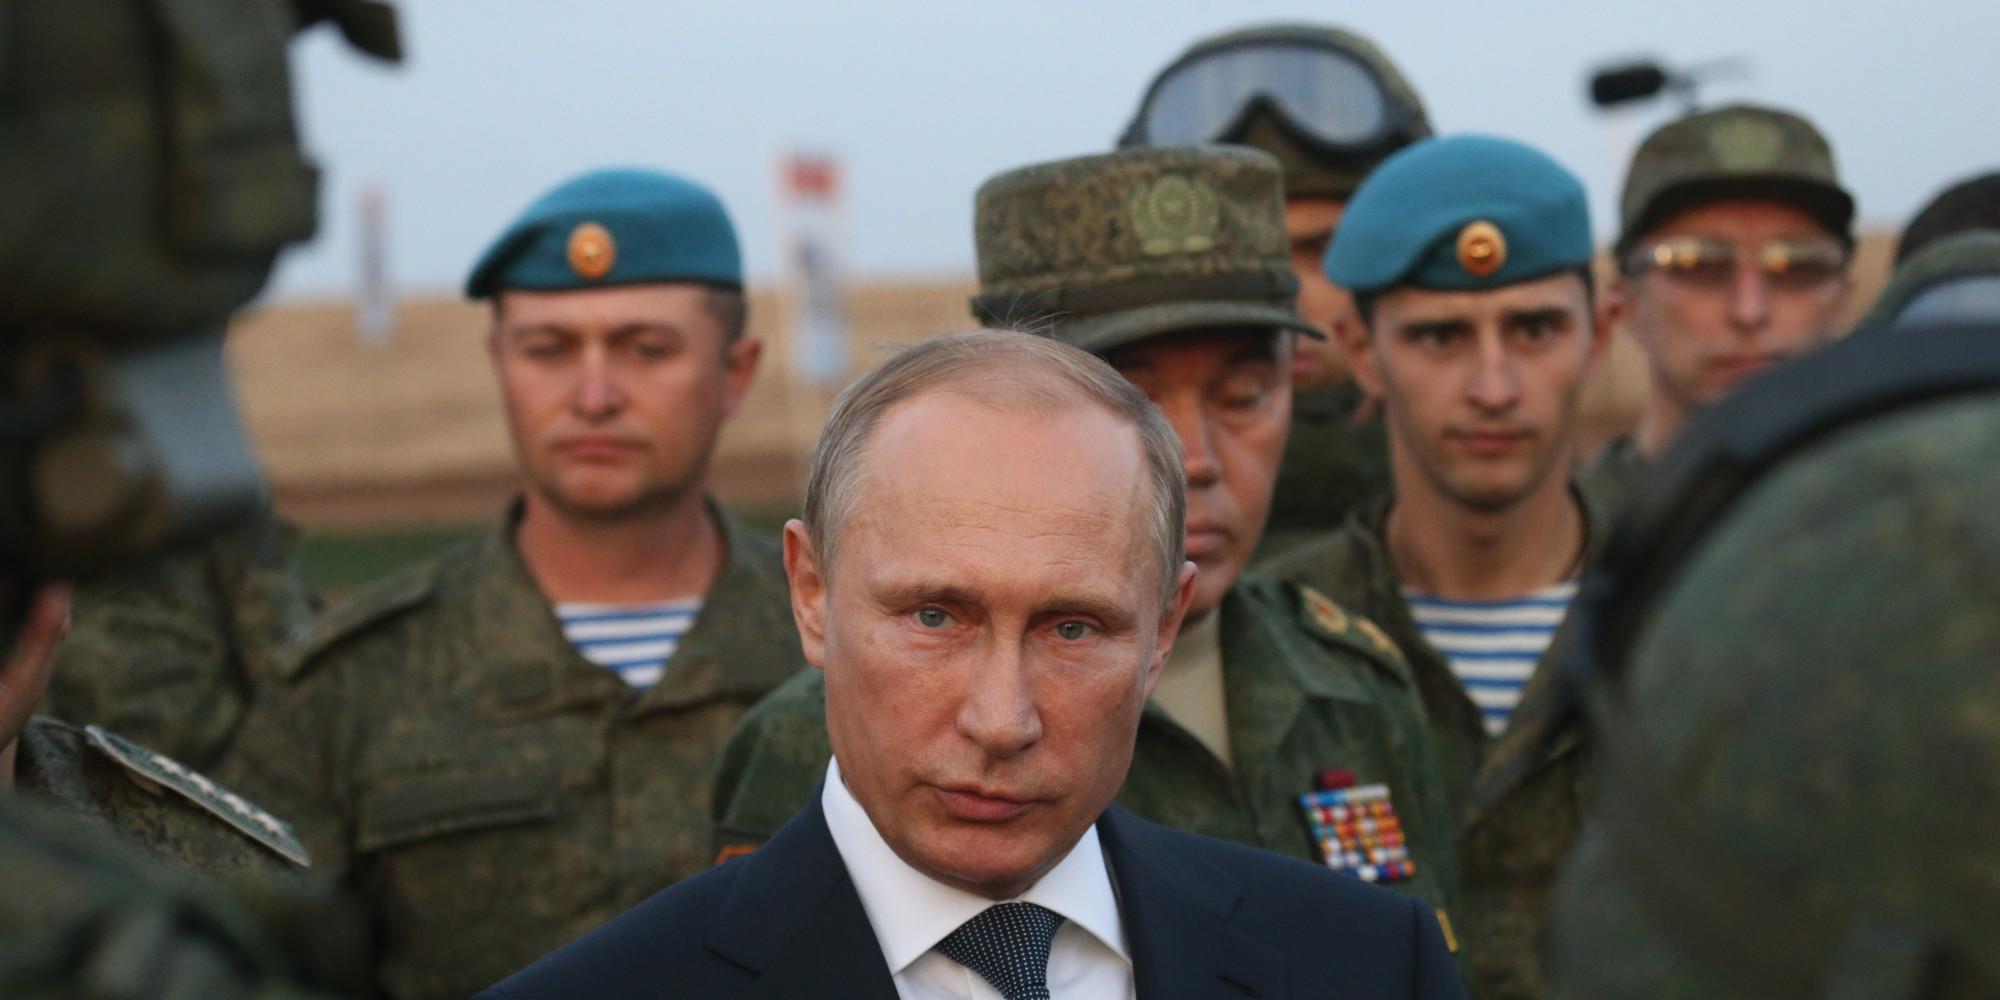 Vadimir-Putin-este-decis-sa-mentina-prezenta-militara-rusa-in-Crimeea